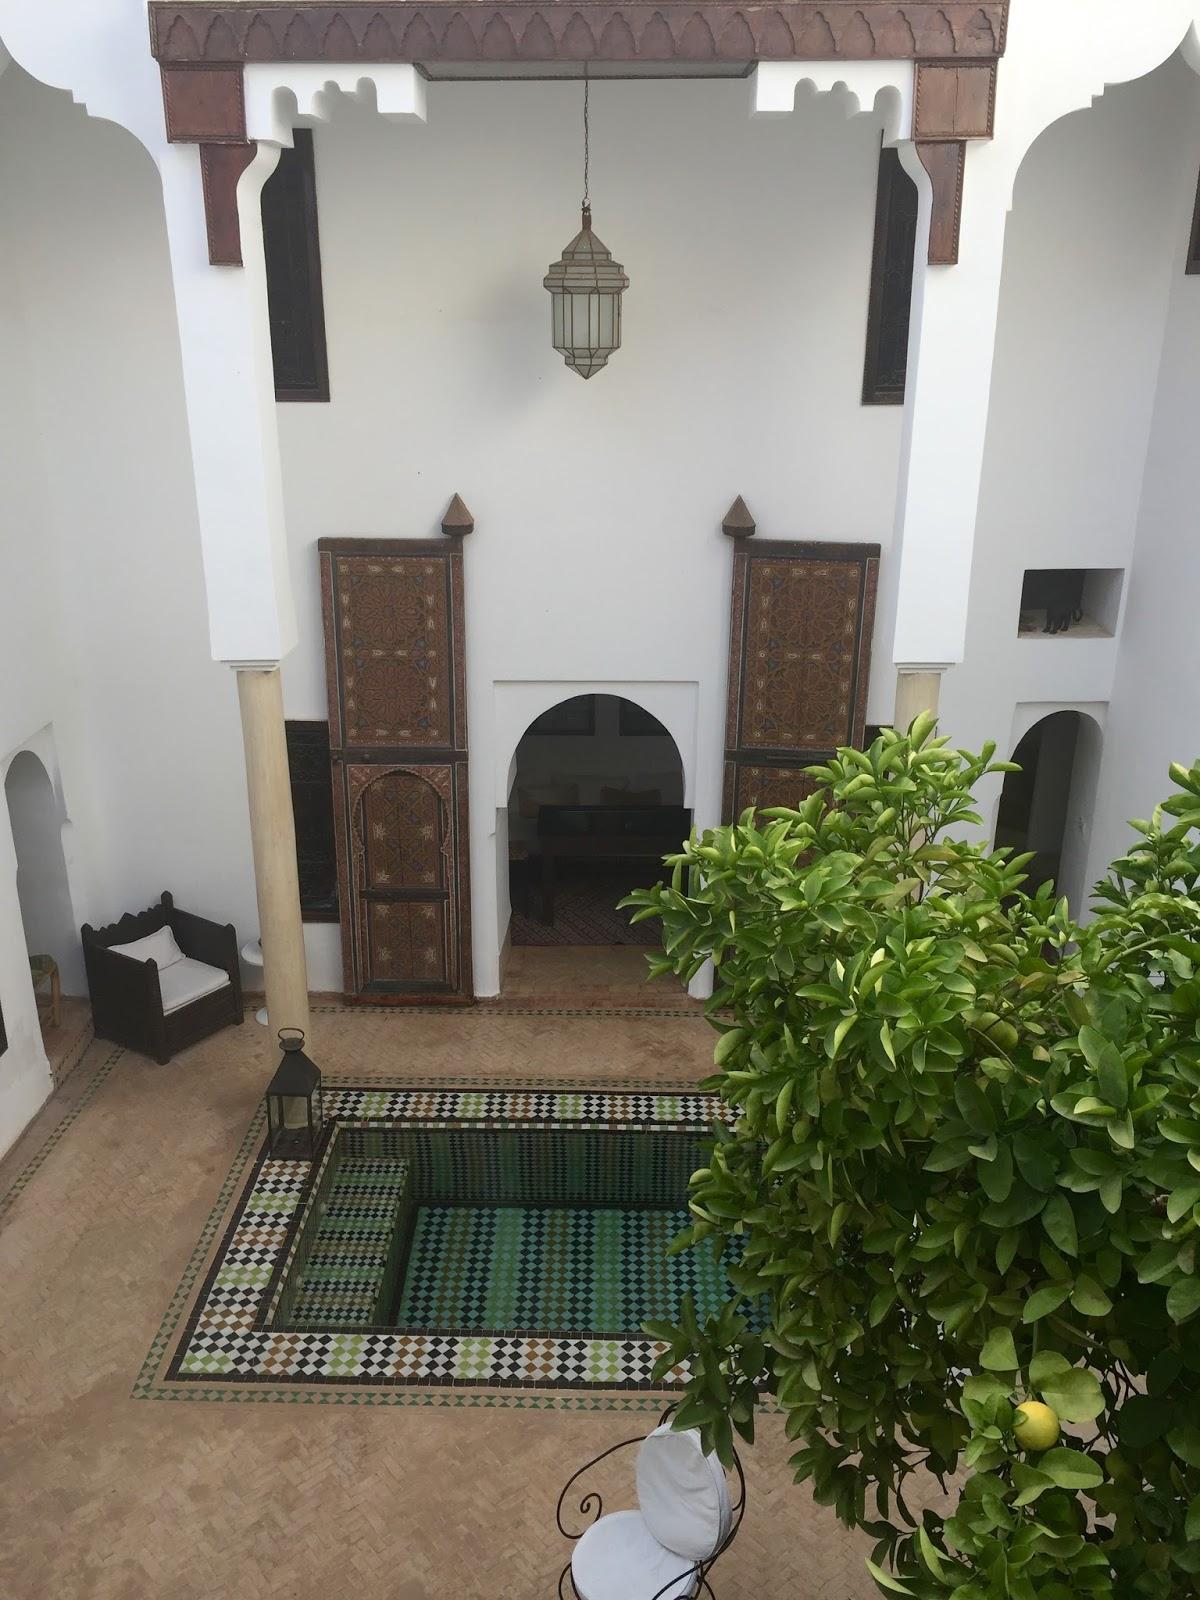 Morocco: 31.7917° N, 7.0926° W